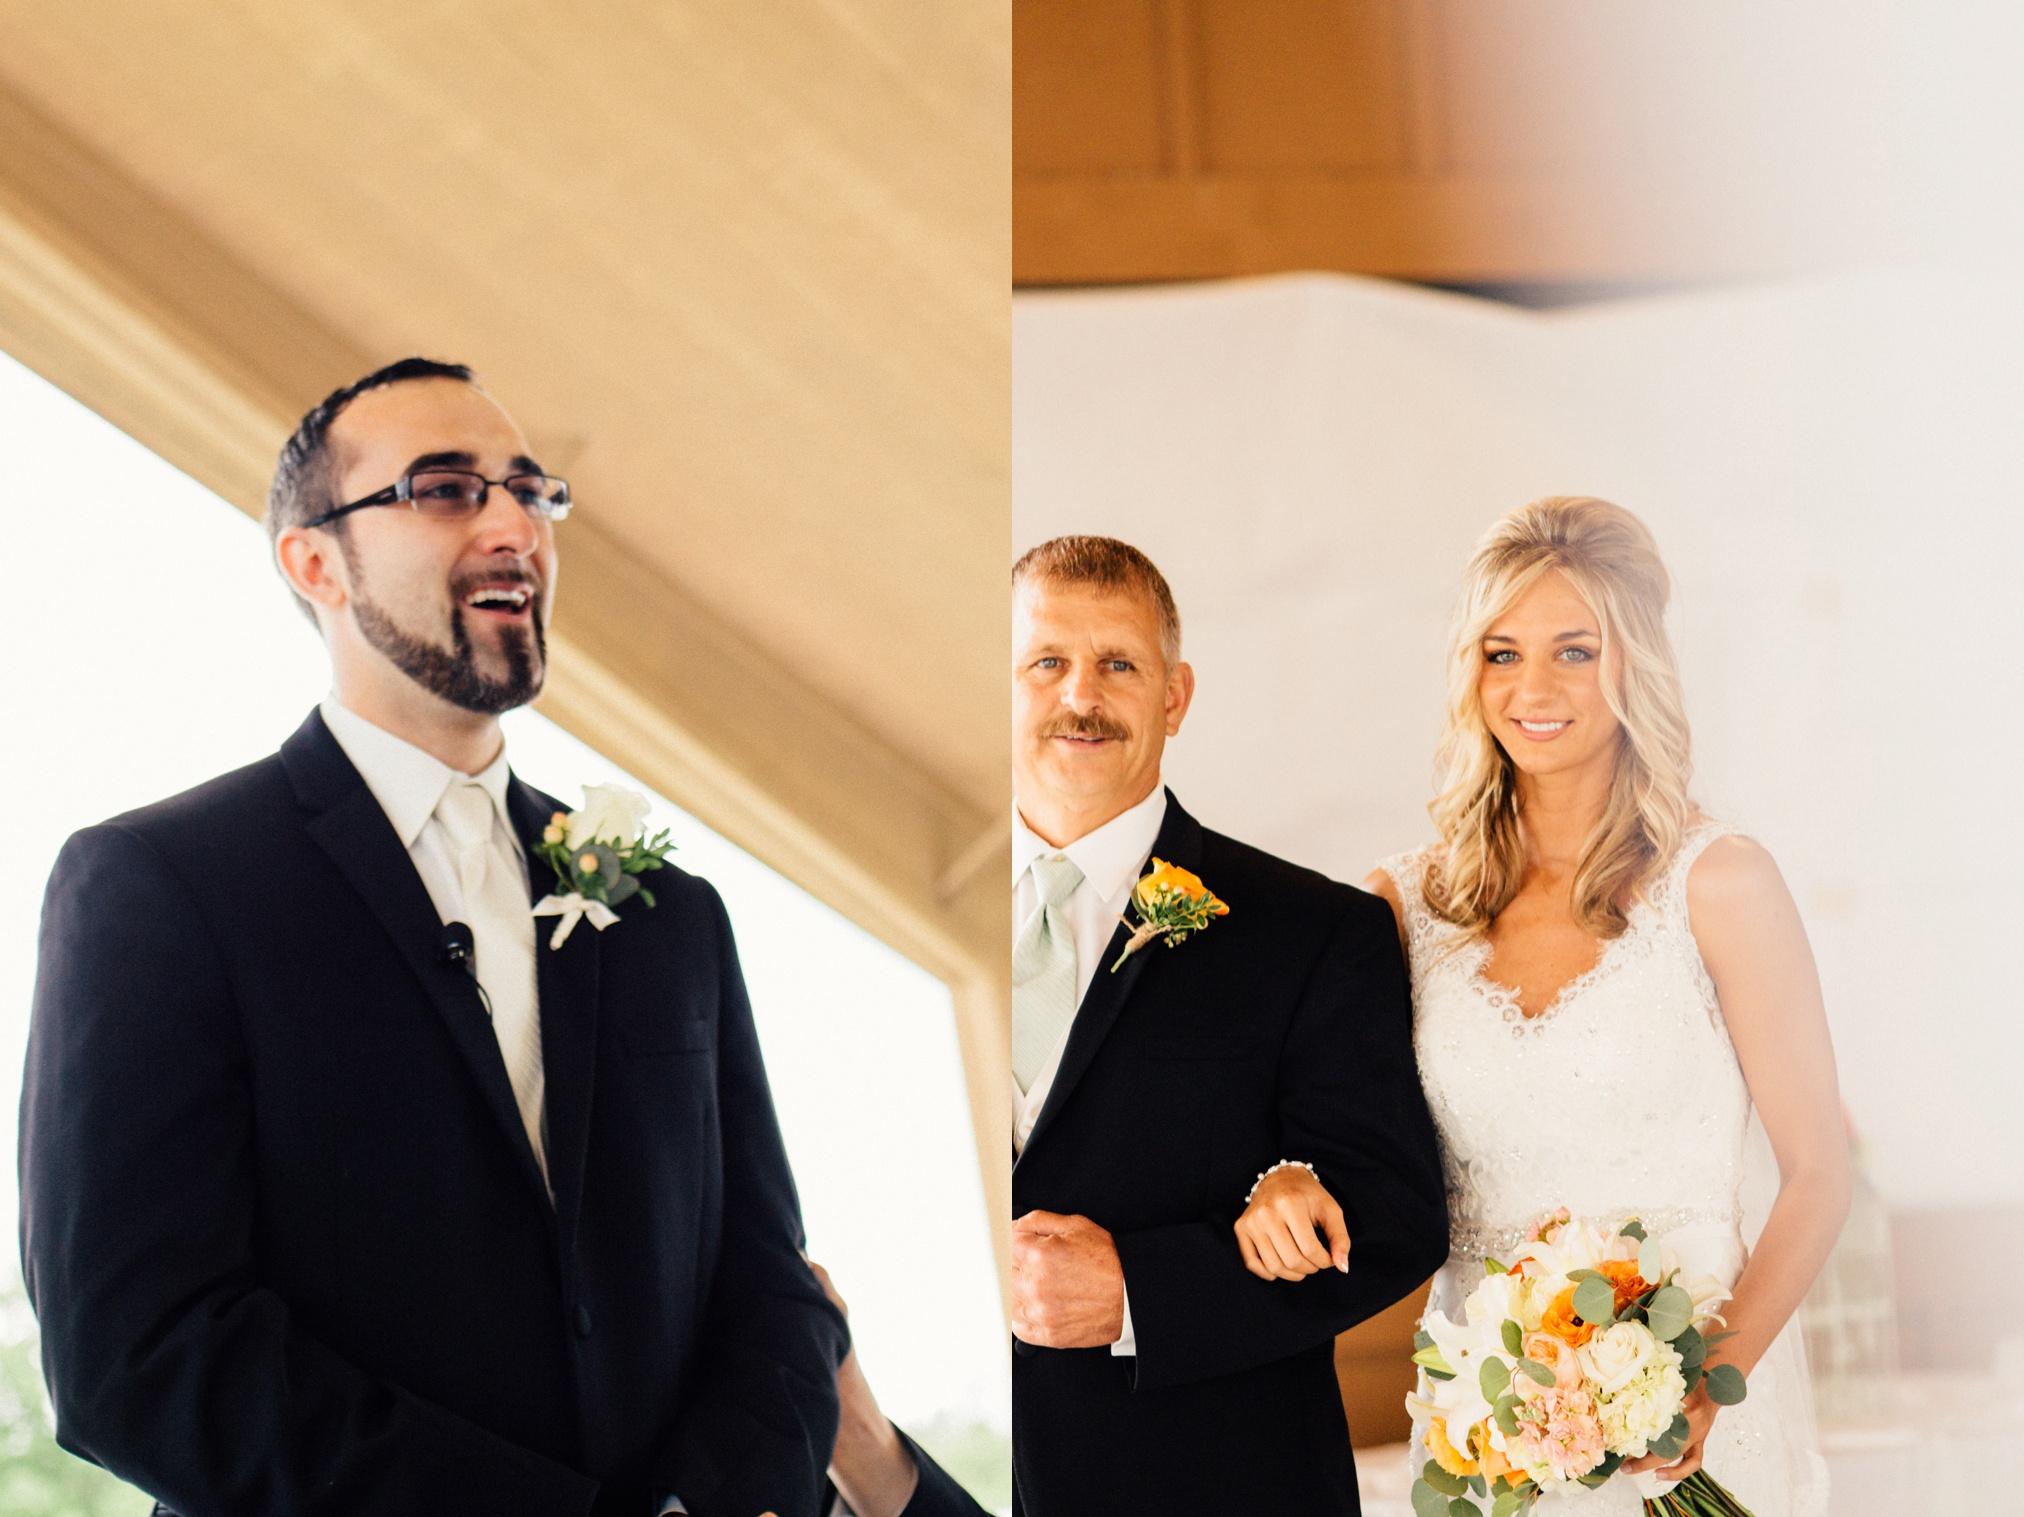 schmid_wedding-375.jpg